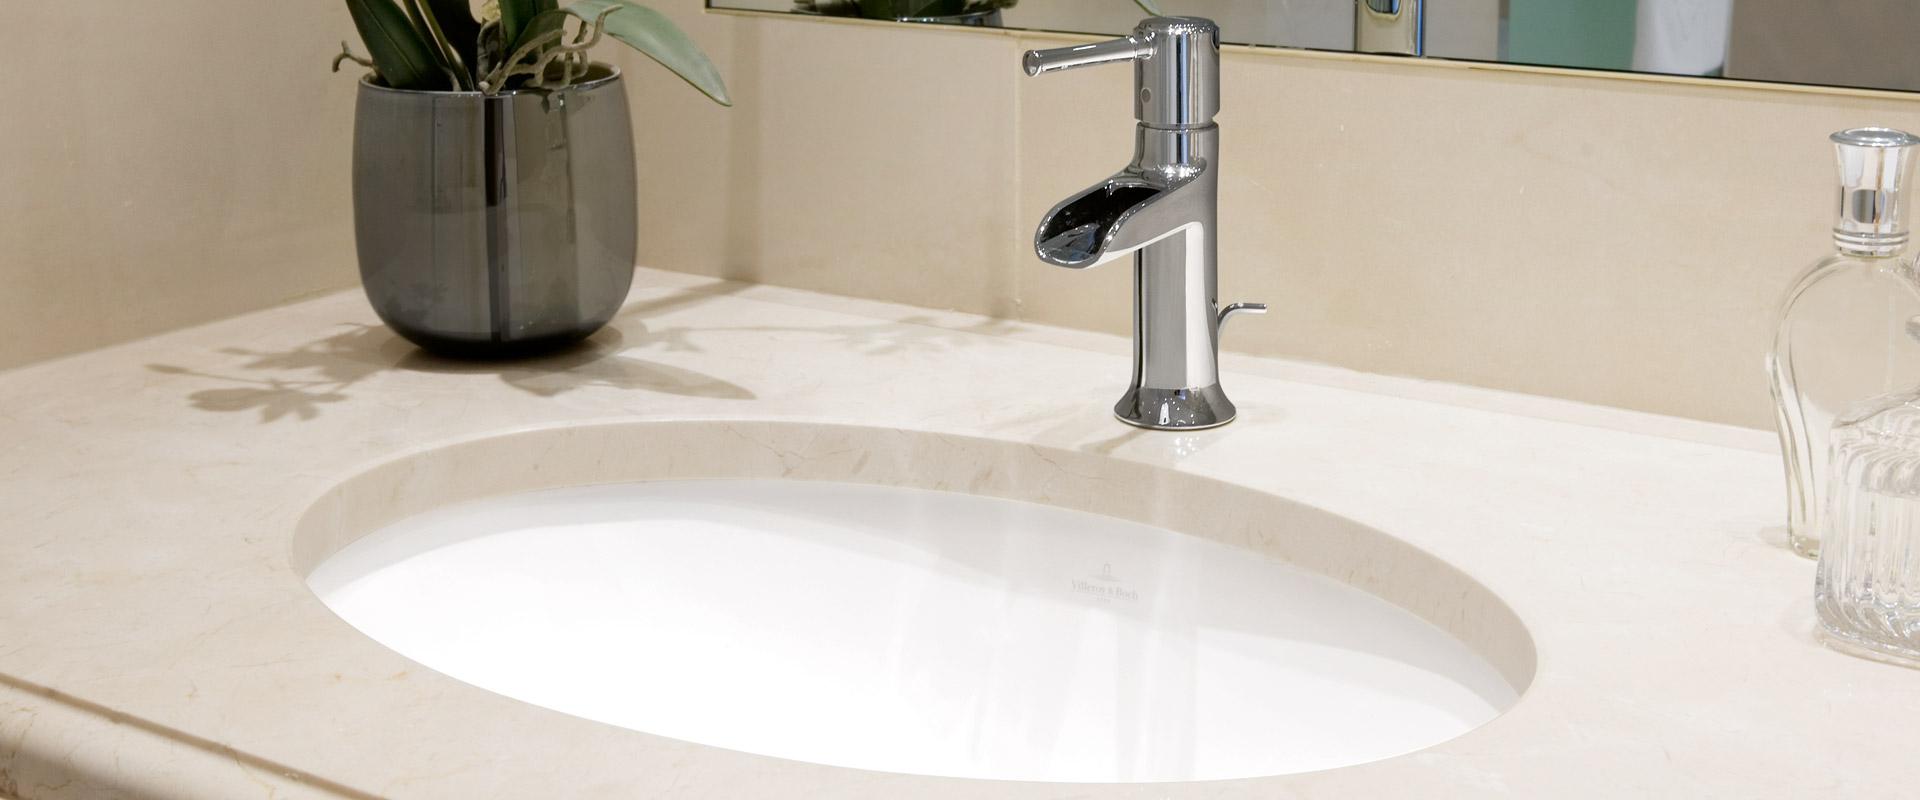 Evana Collection By Villeroy Boch Sleek Bathroom Design